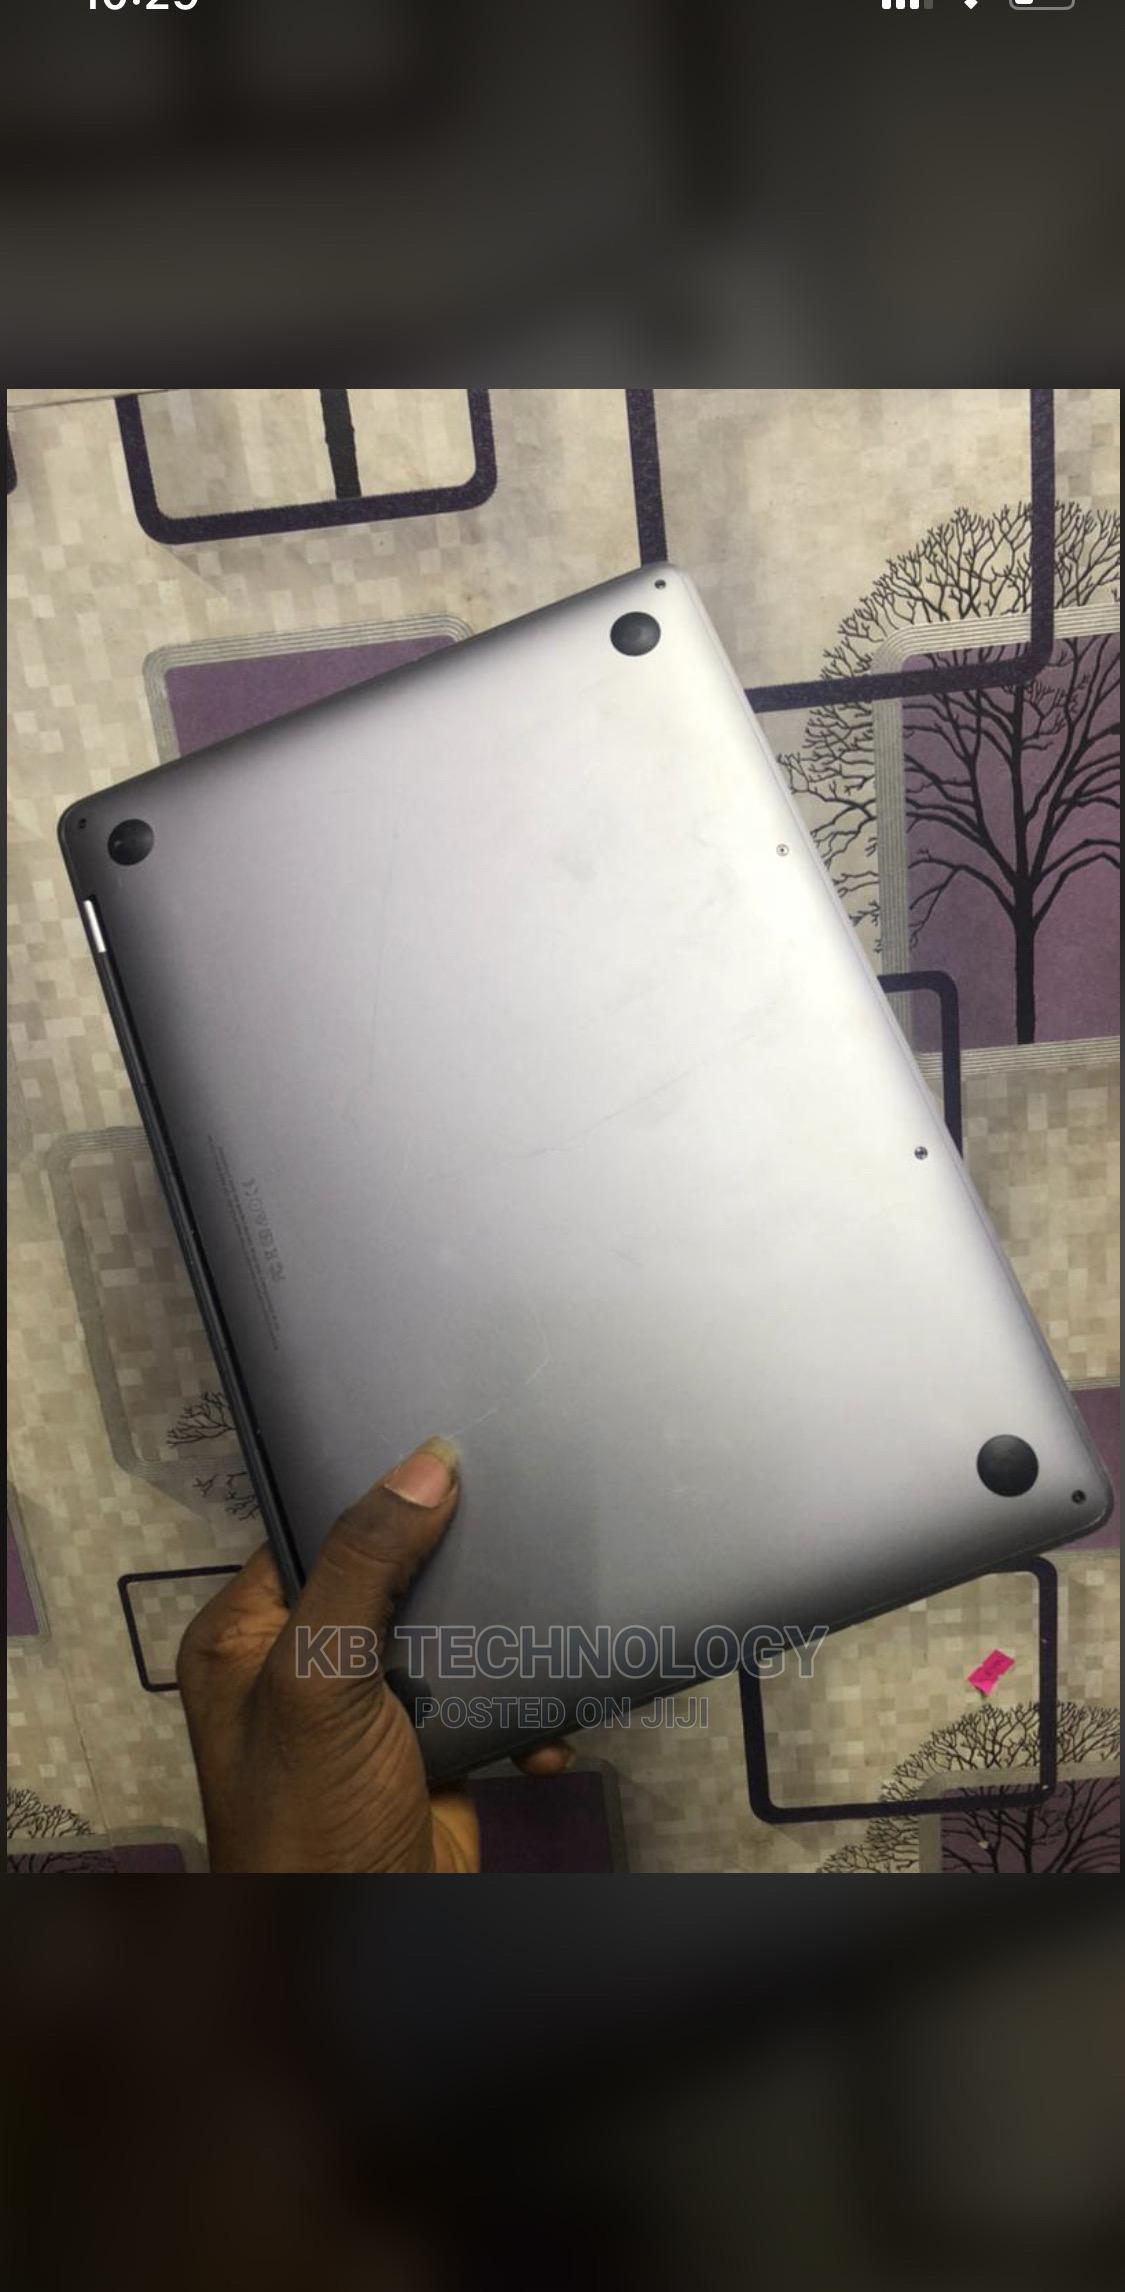 Laptop Apple MacBook 2019 8GB Intel Core I5 SSD 256GB | Laptops & Computers for sale in Ibadan, Oyo State, Nigeria